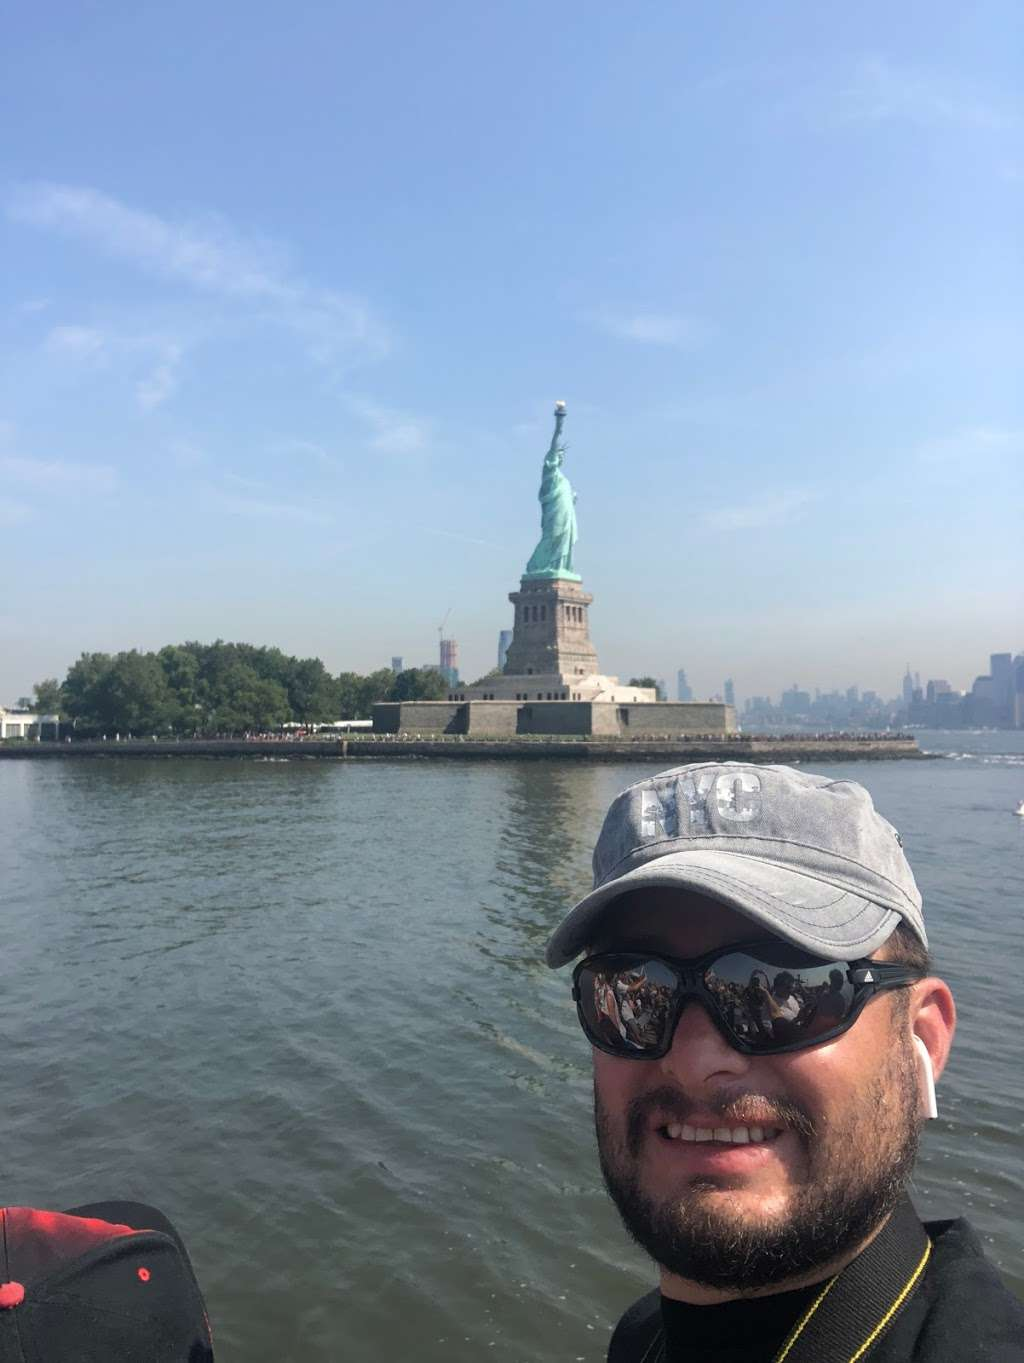 Circle Line Statue of Liberty - travel agency  | Photo 3 of 3 | Address: 80 Audrey Zapp Dr, Jersey City, NJ 07304, USA | Phone: (877) 523-9849